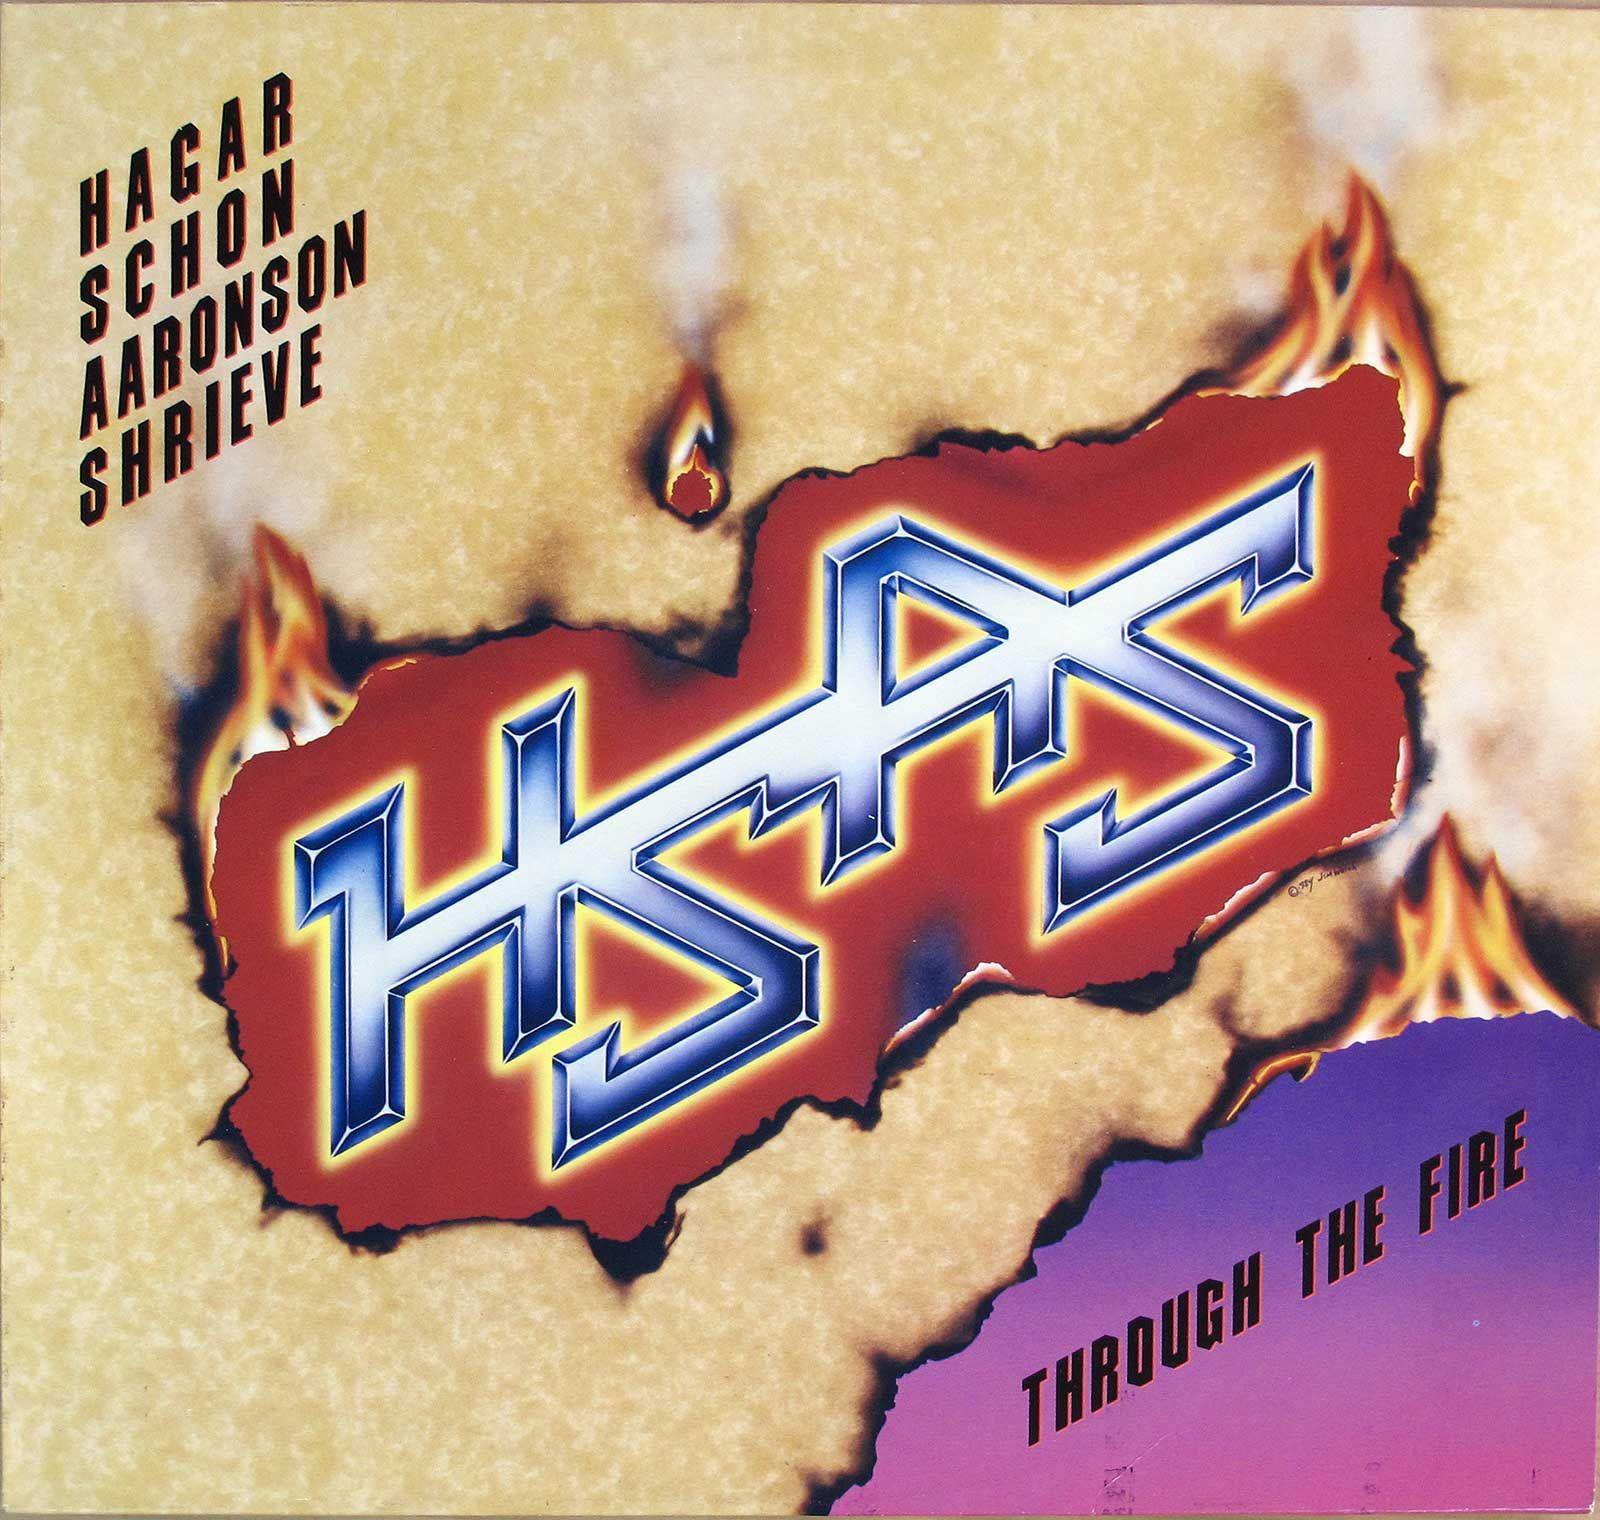 Hsas Band Hagar Schon Aaronson Shrieve Through The Fire American Hard Rock Heavy Metal Vinyl Album Information For Collectors Record Price Guide